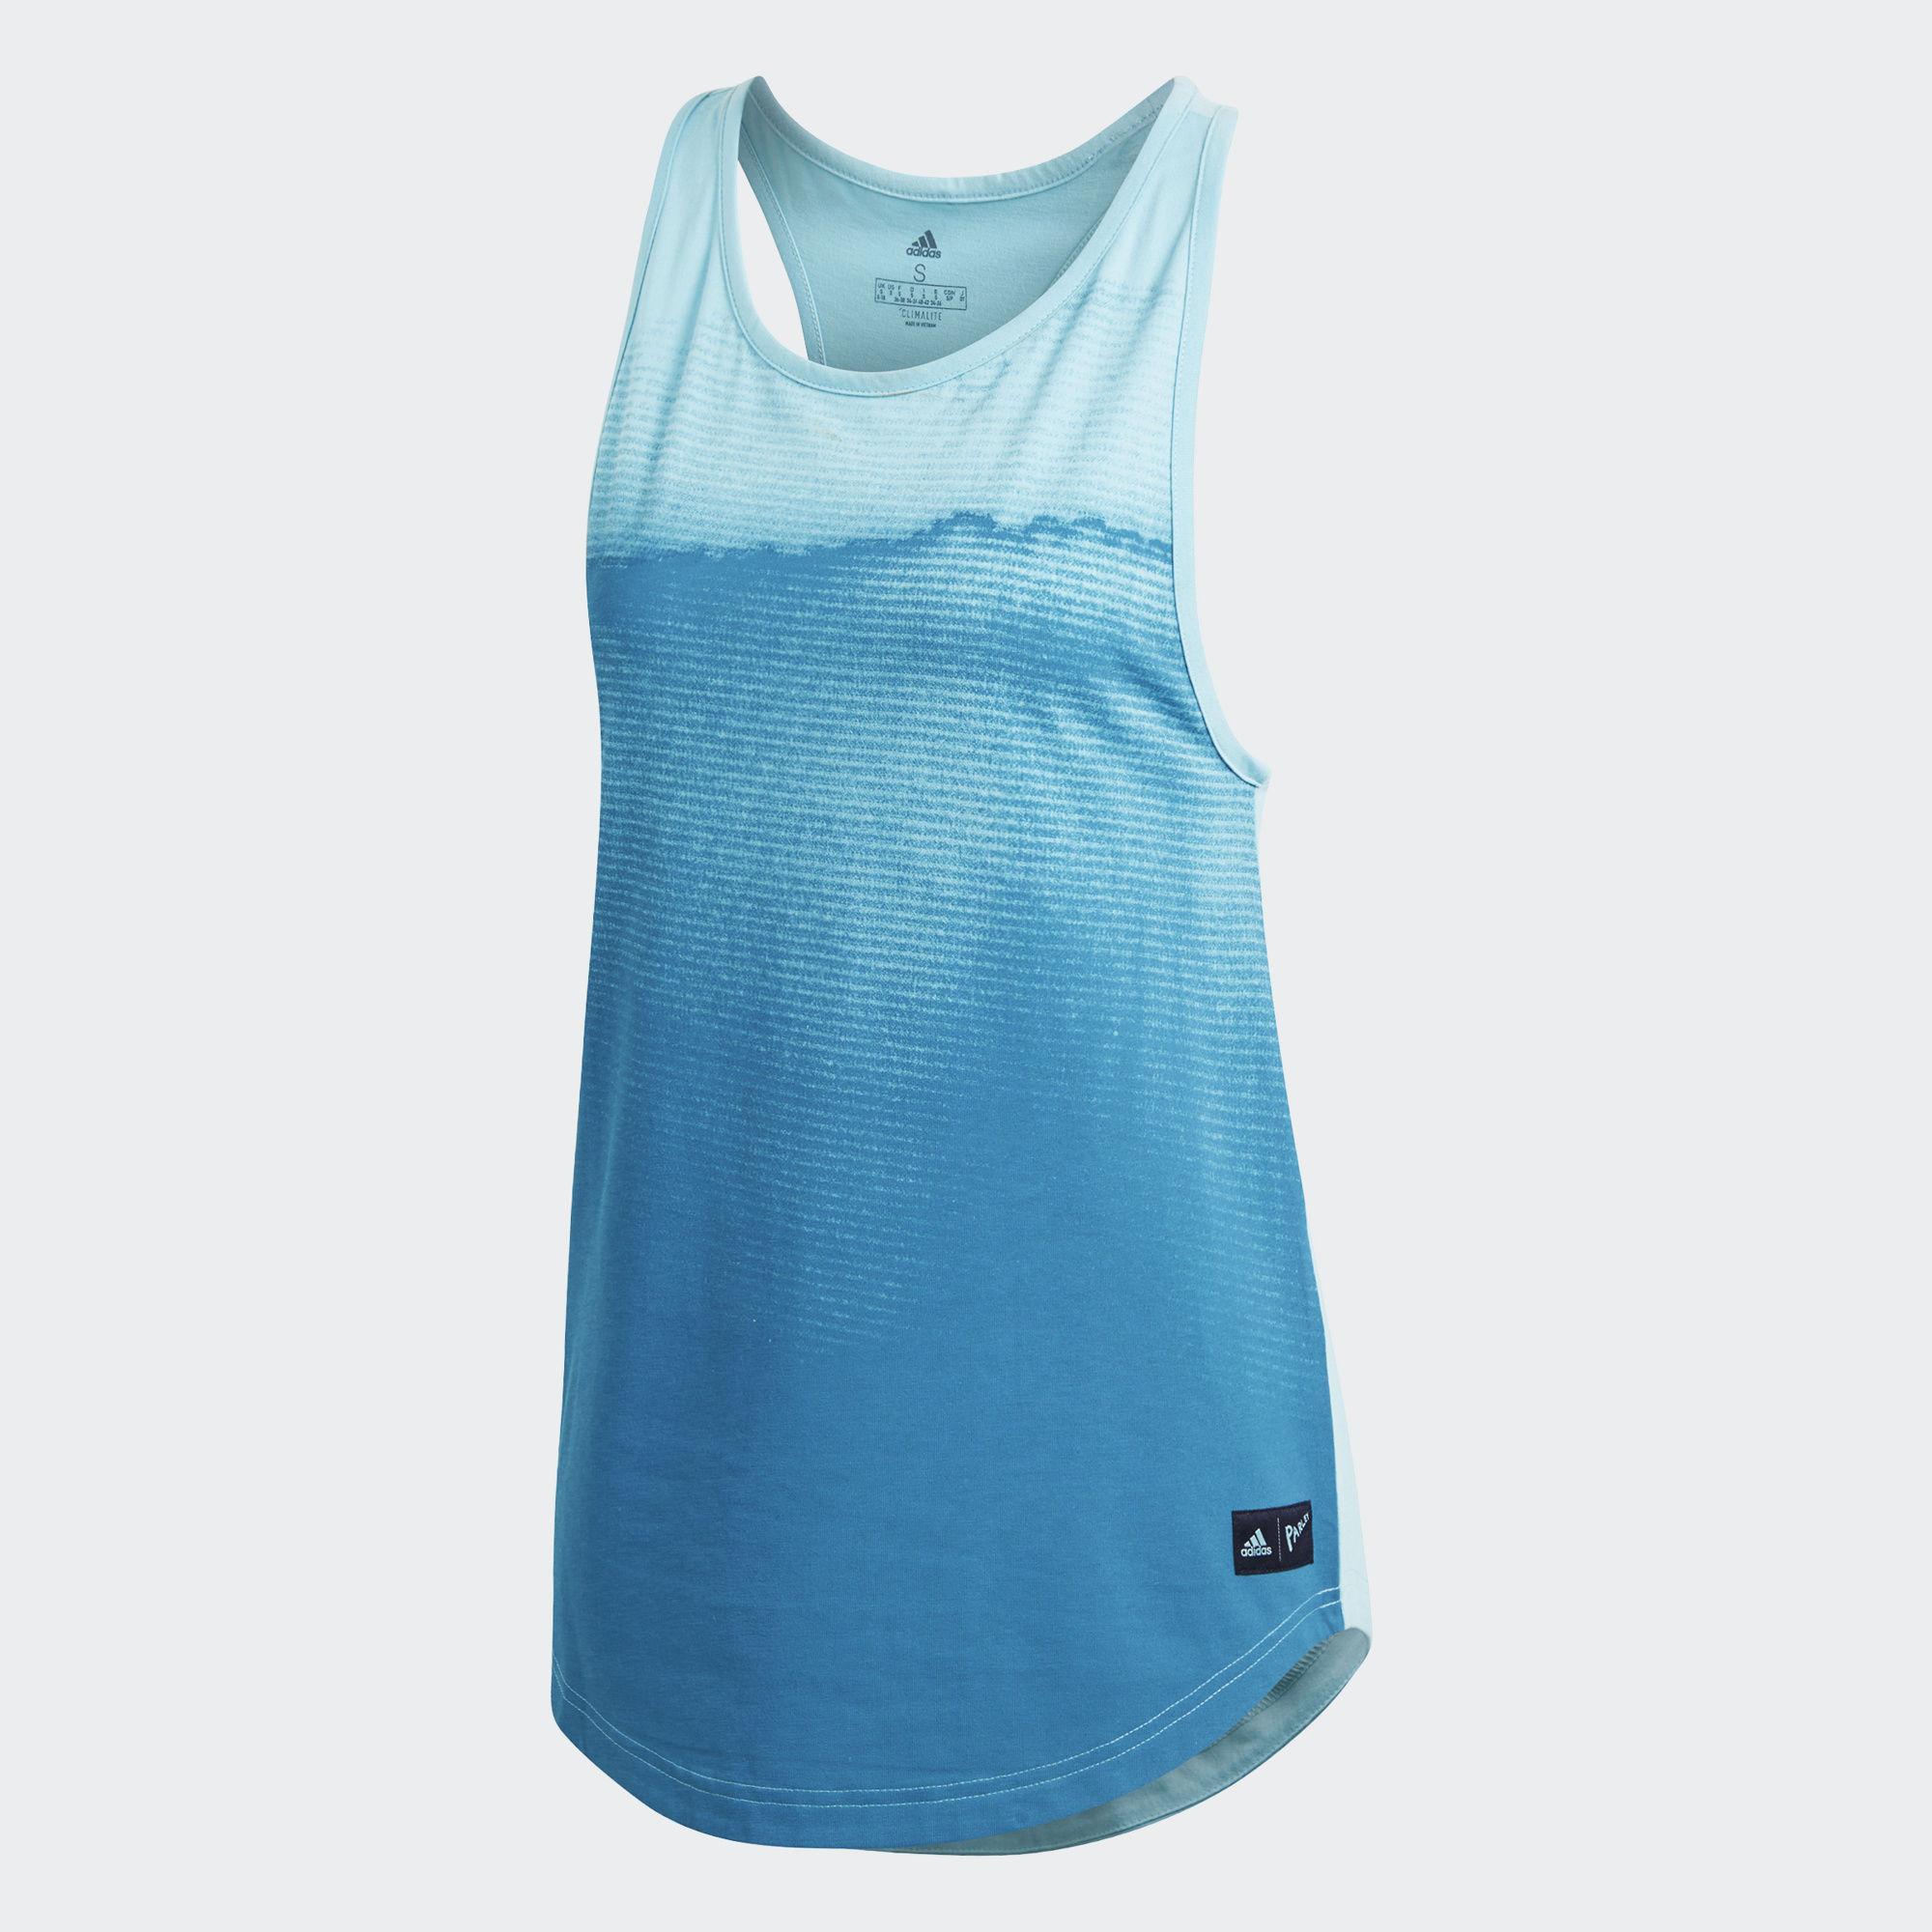 a0597fb03df Adidas Womens Parley Tank - Blue Spirit - Tennisnuts.com